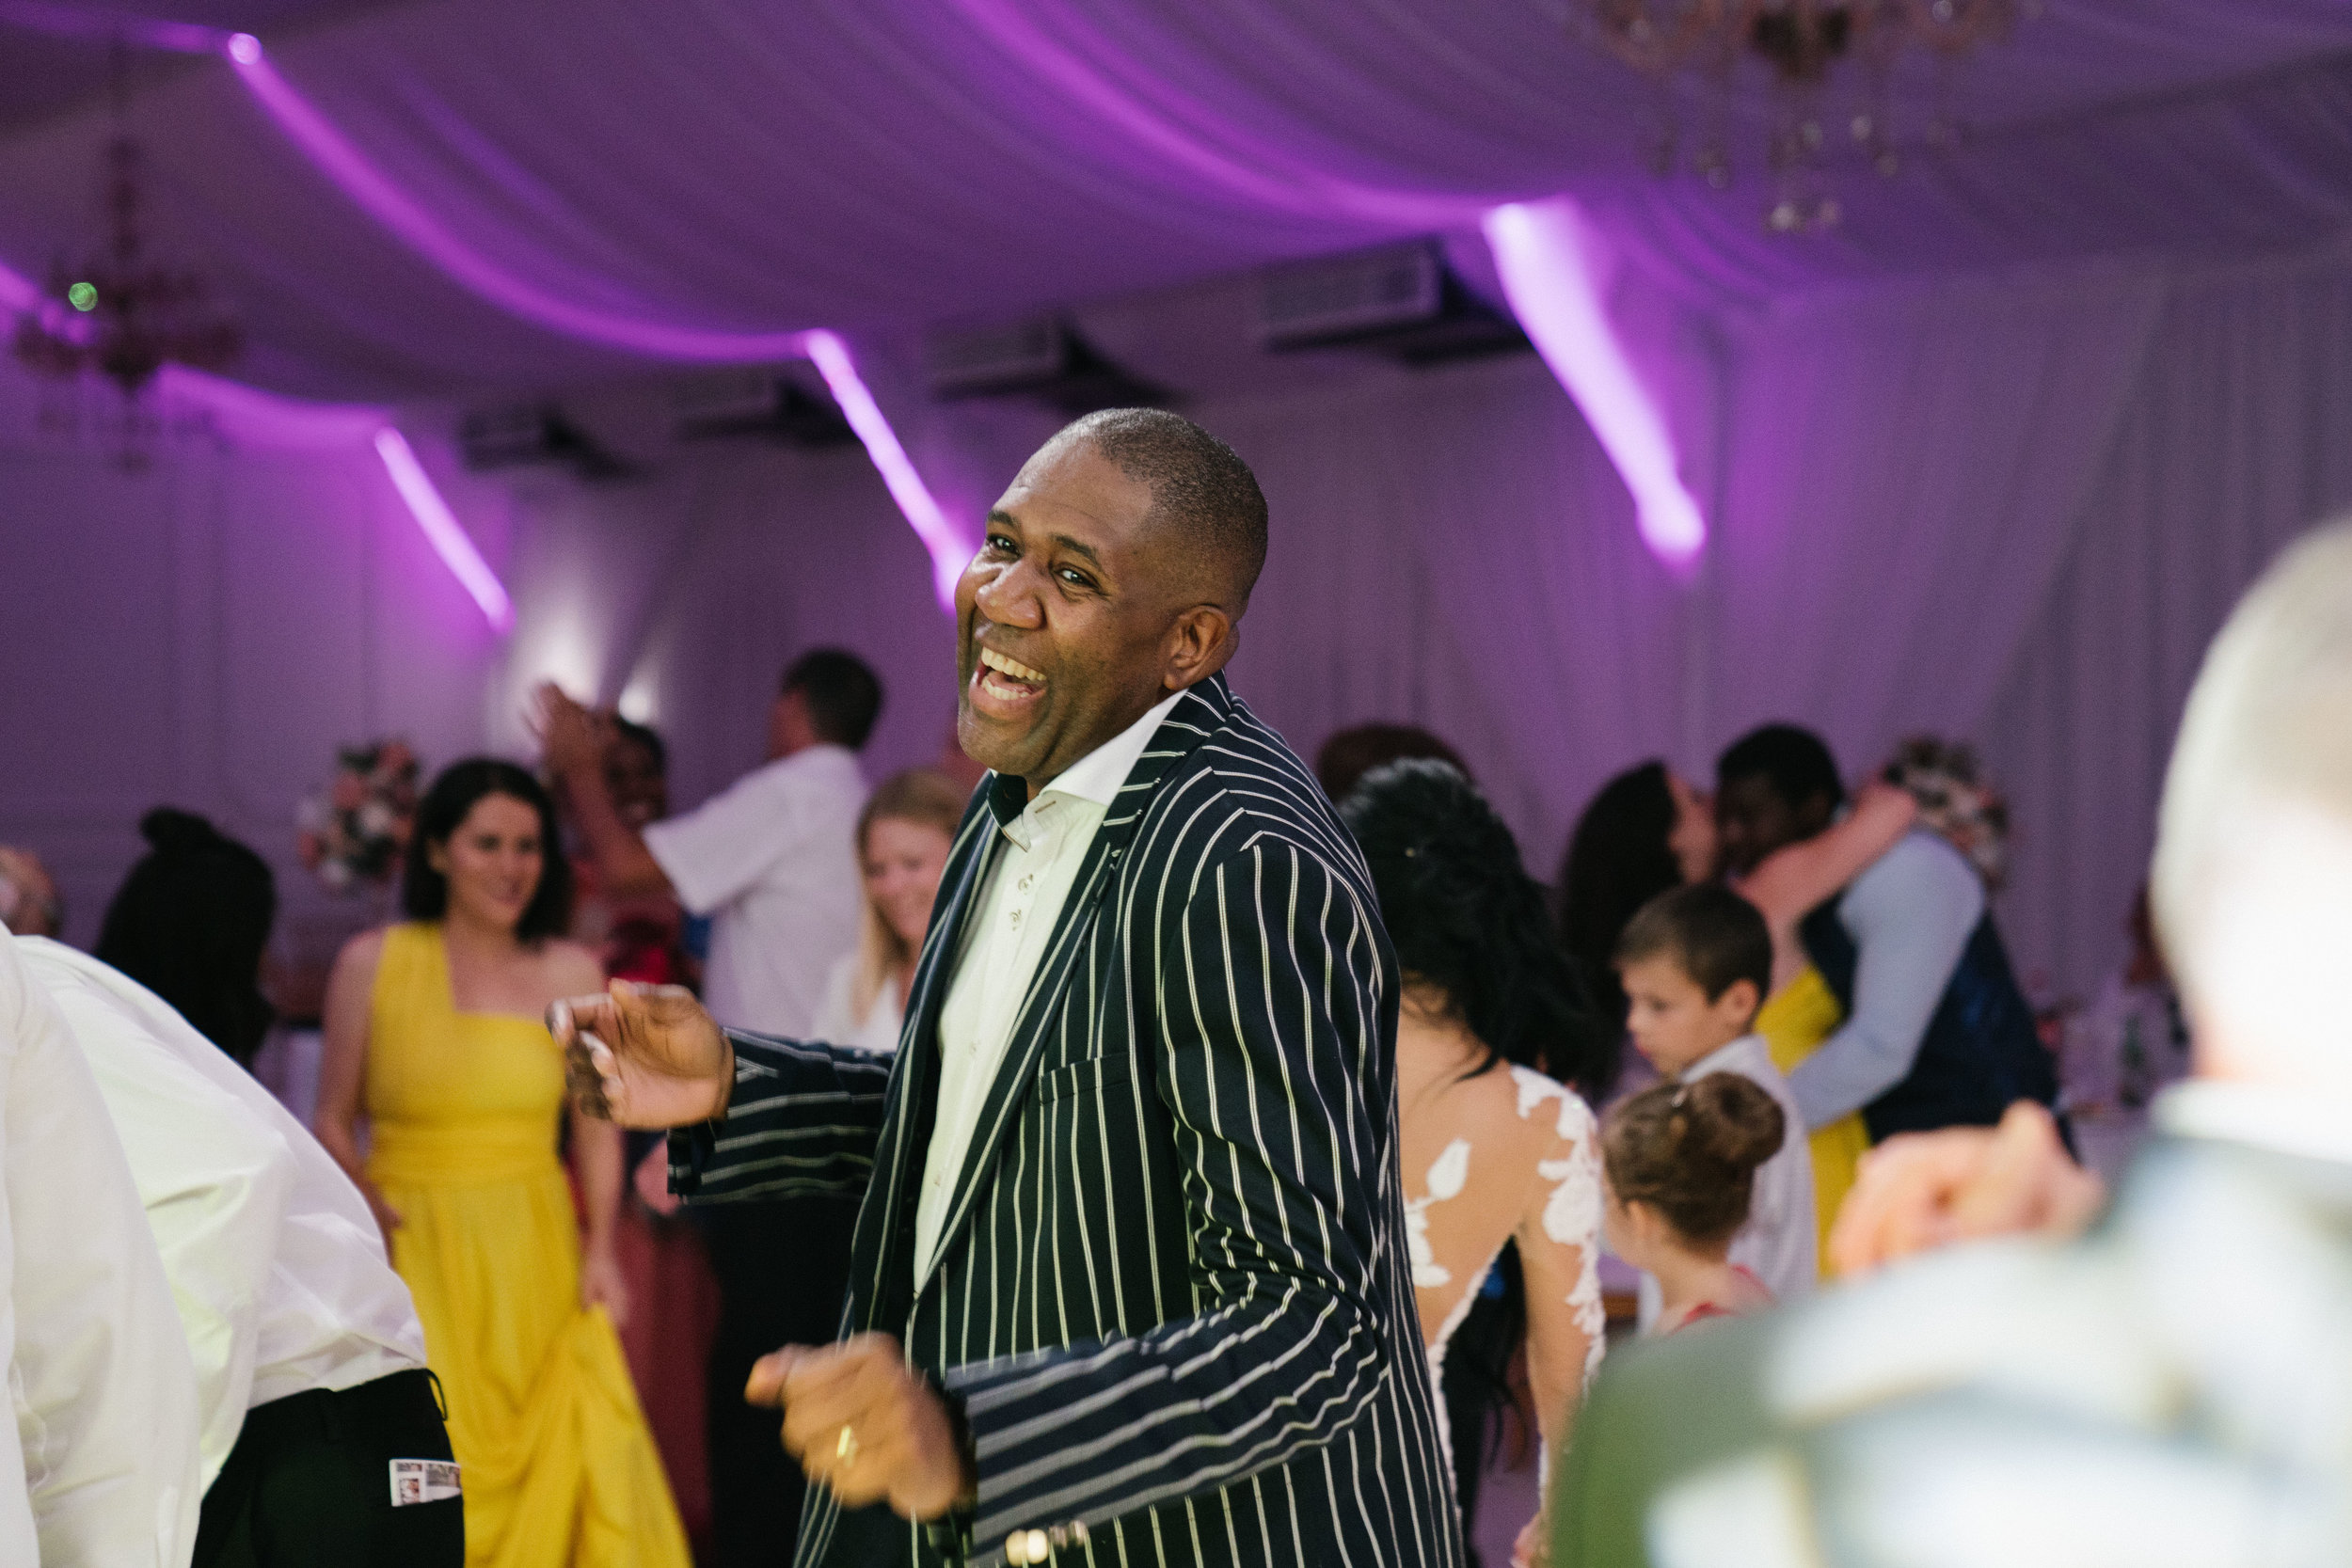 london-romania-destination-wedding-photographer-videographer-115